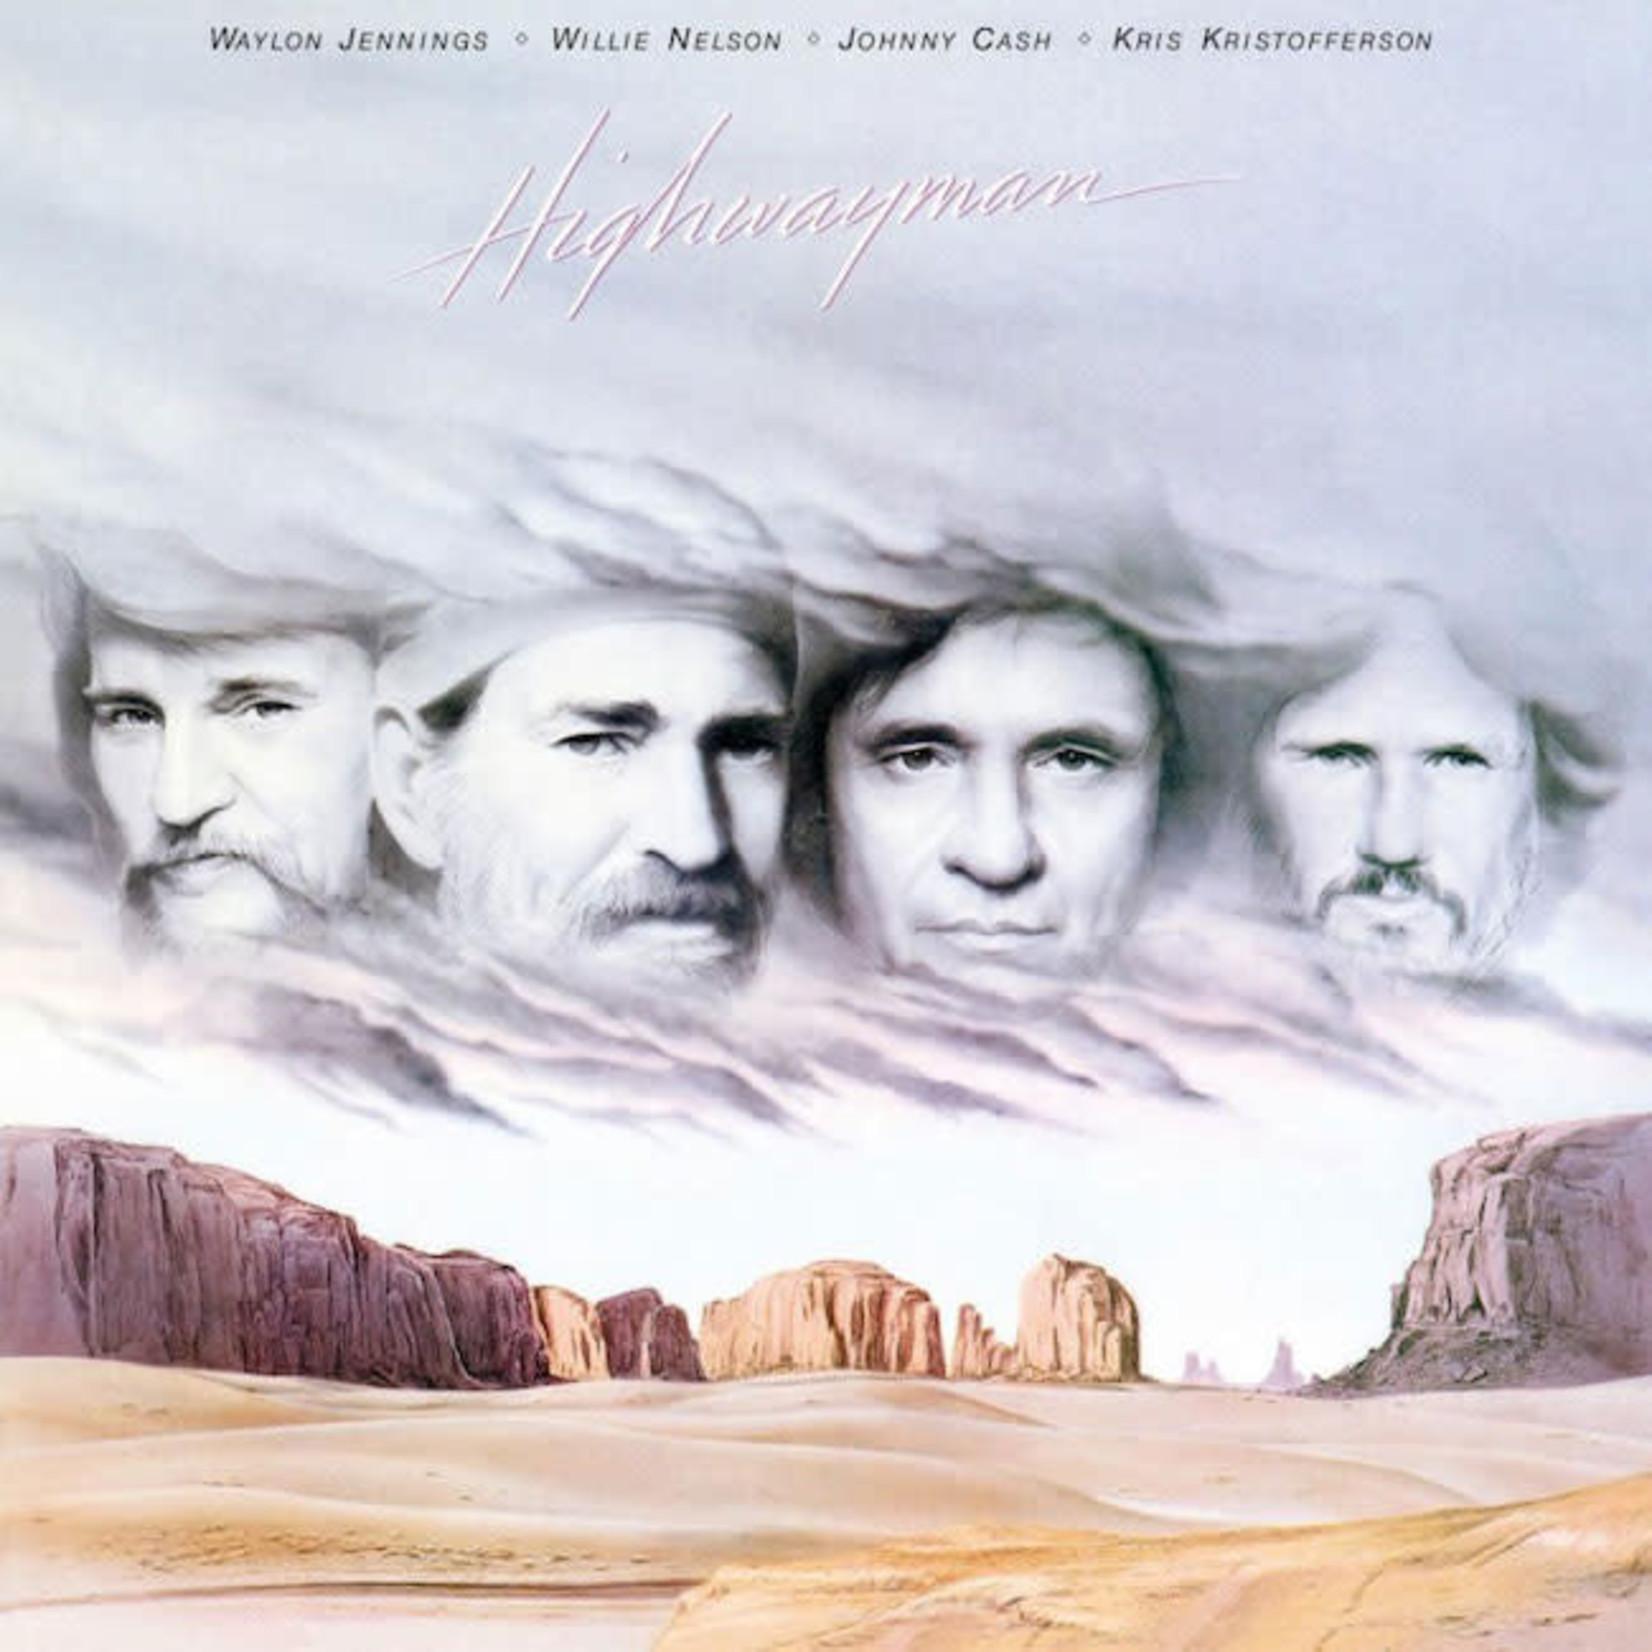 [Vintage] Jennings, Nelson, Cash, Kristofferson: Highwayman